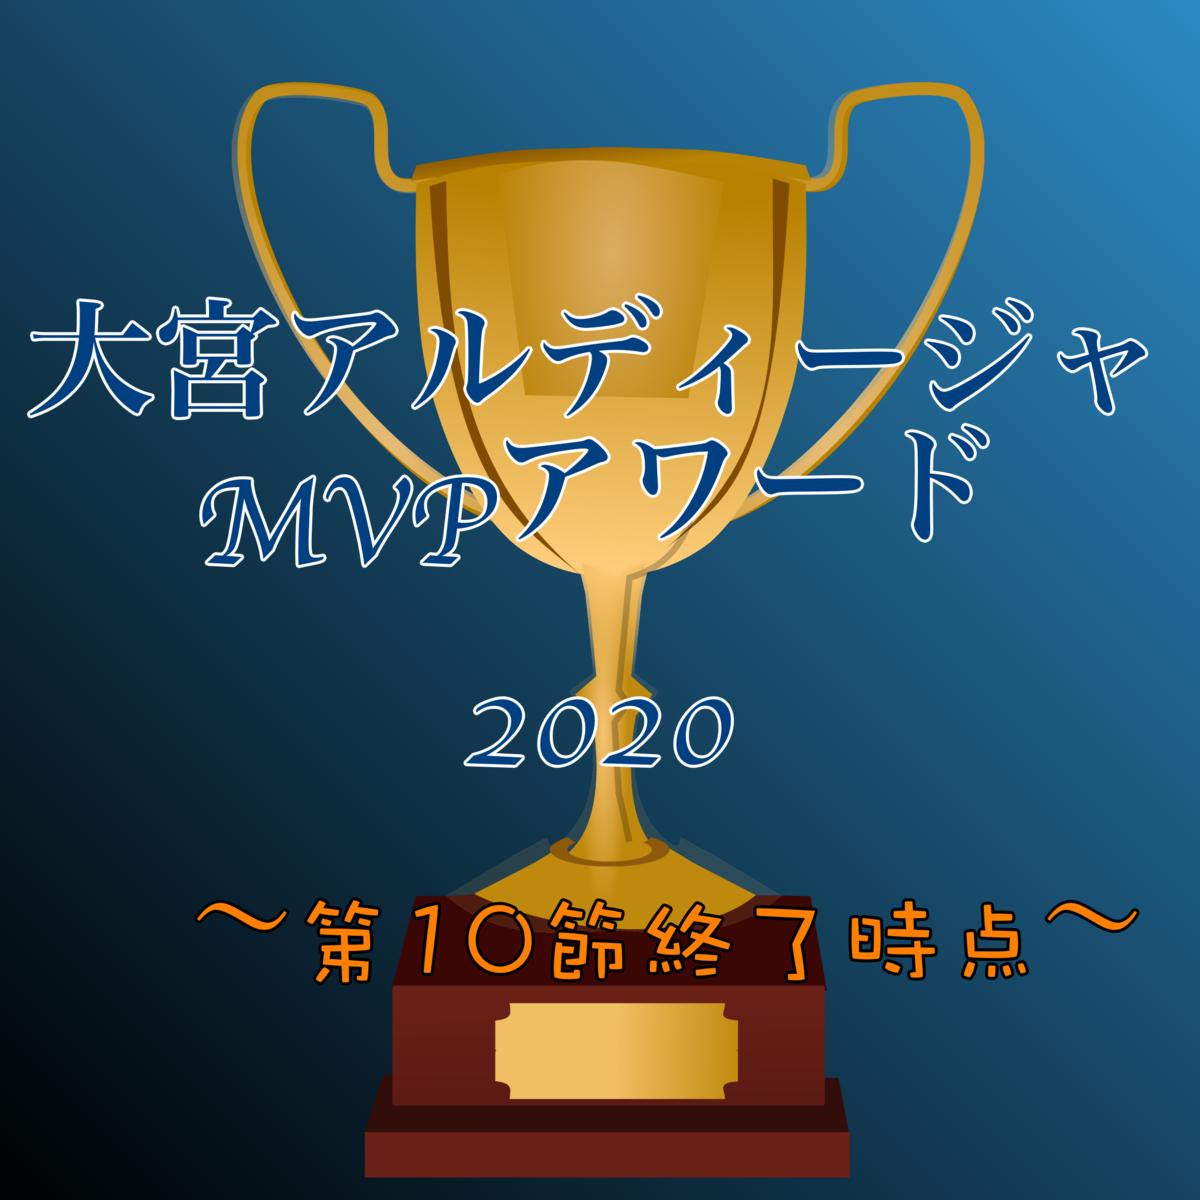 f:id:Omiyadangikai:20200811211206p:plain